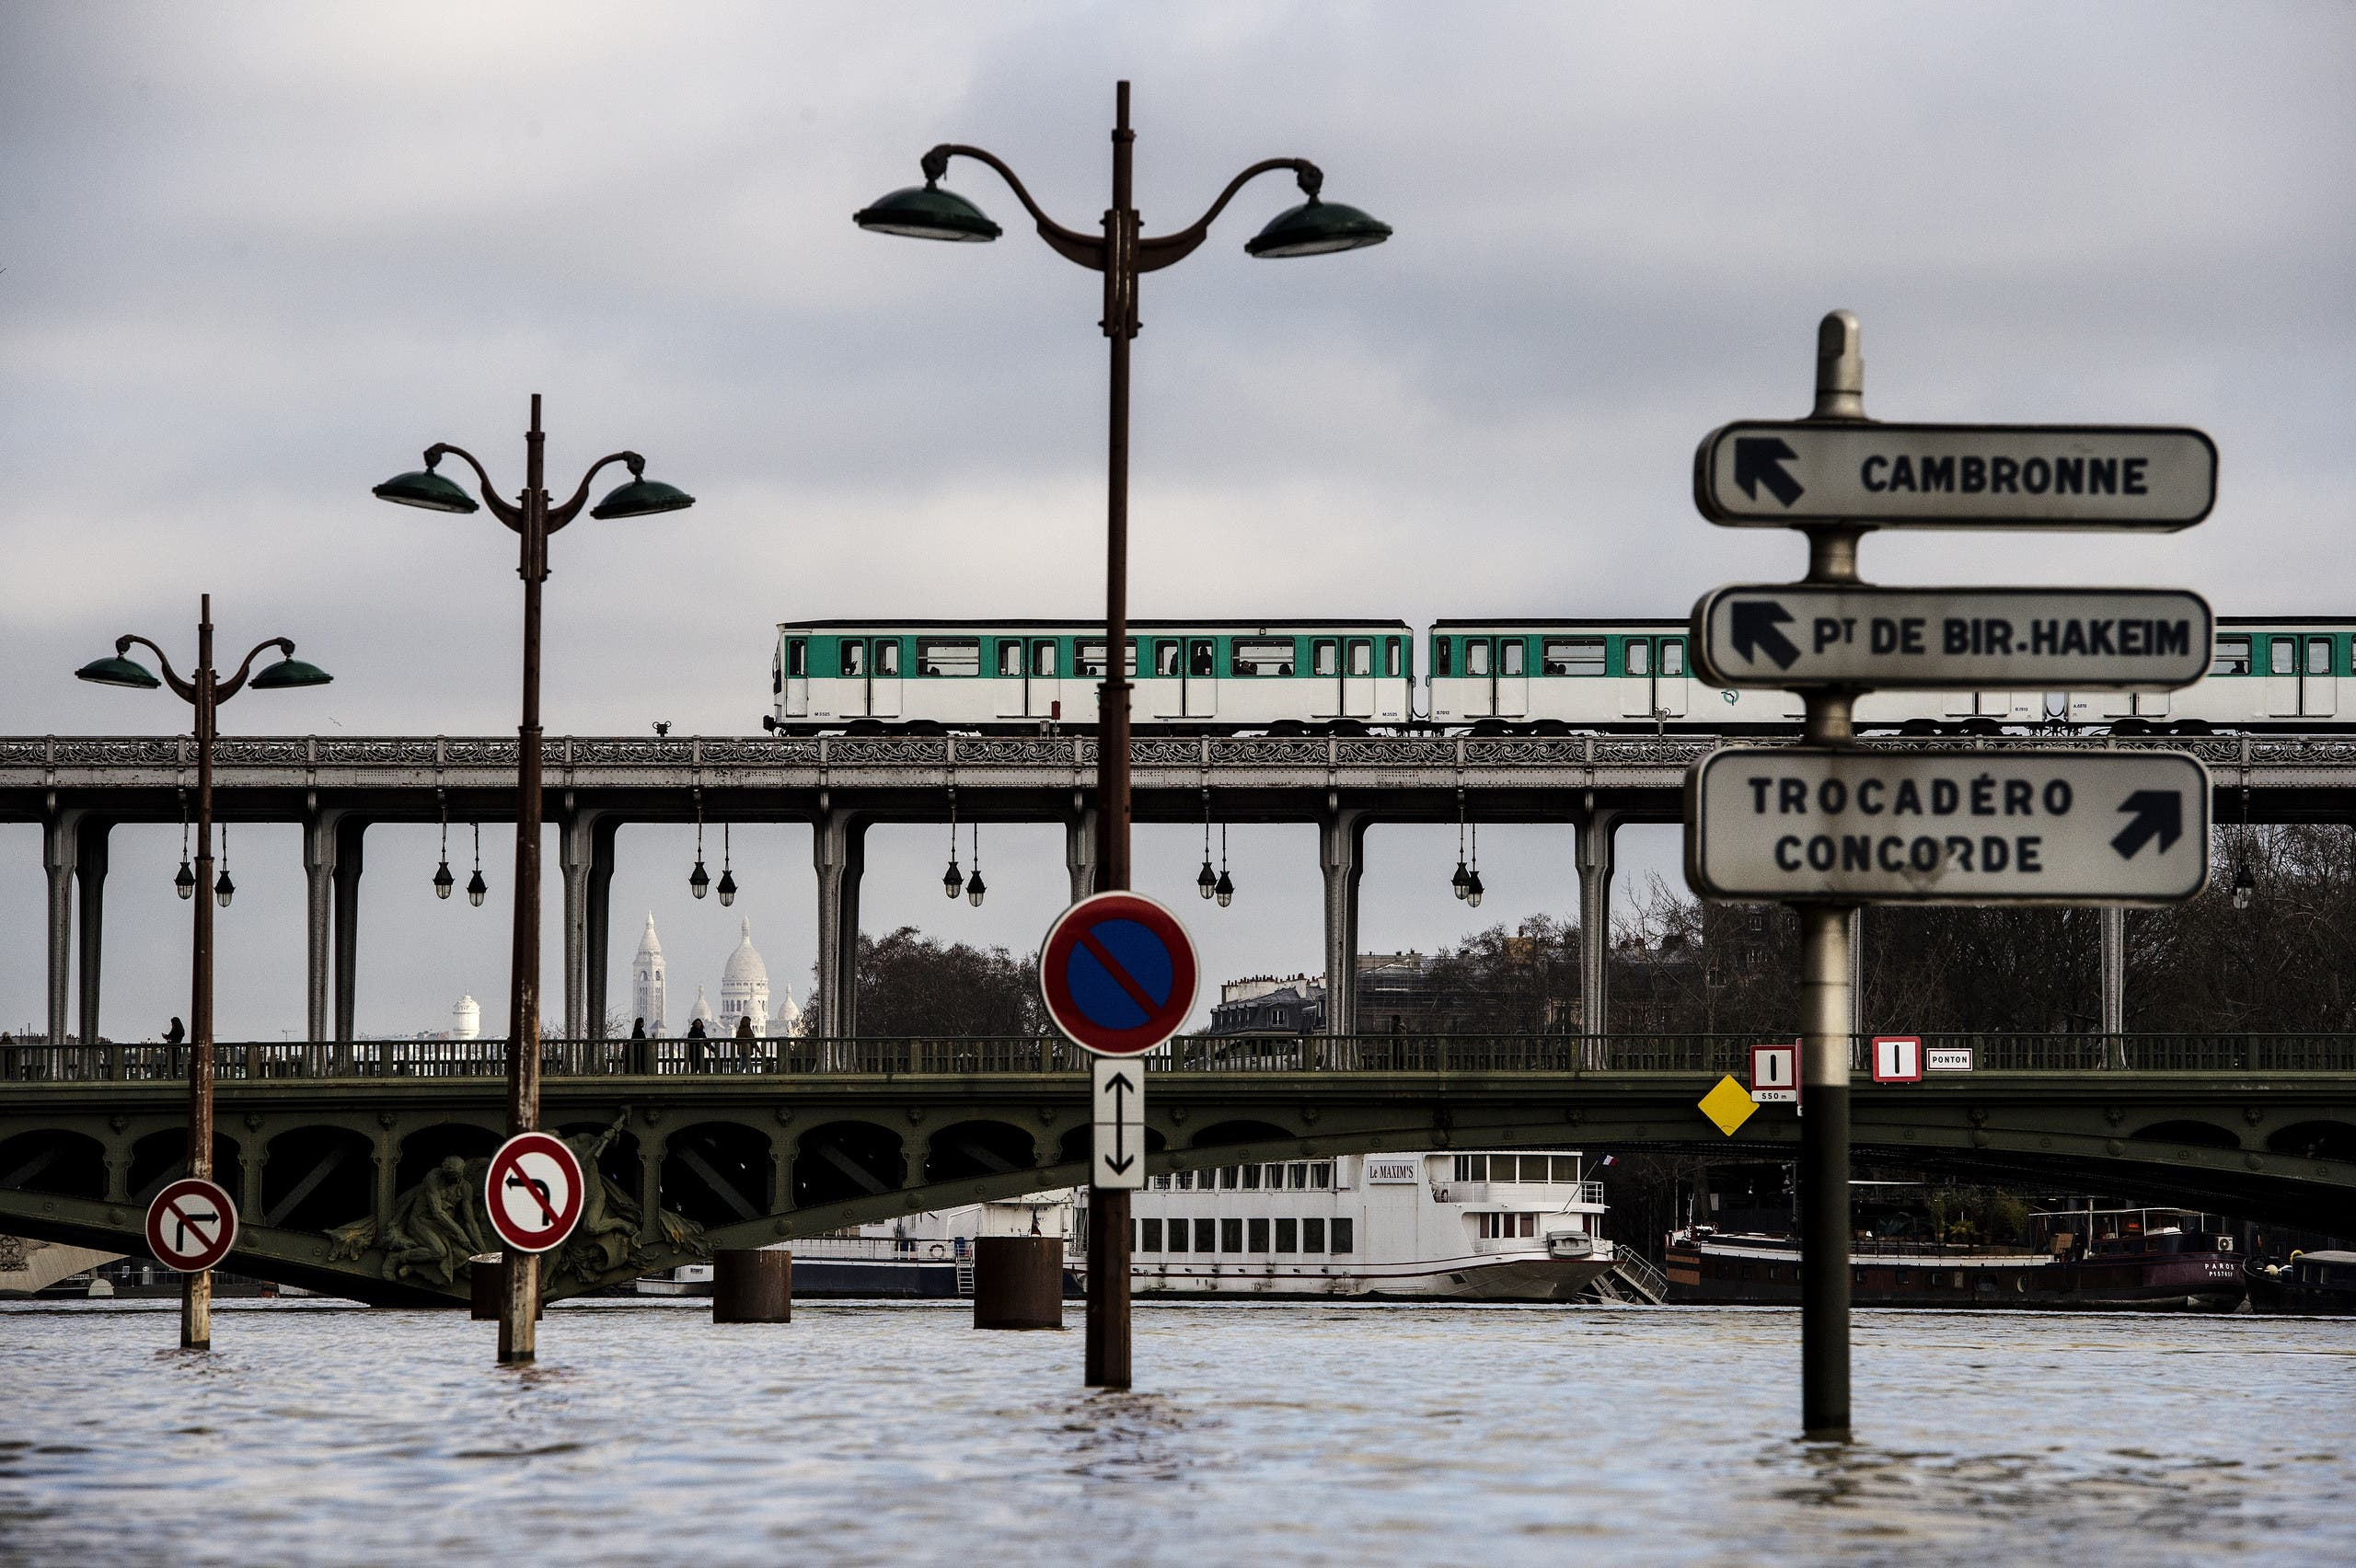 Pedestrians and a metro train cross the swollen Seine river on the Bir-Hakeim bridge in Paris on January 26, 2018. (AFP)